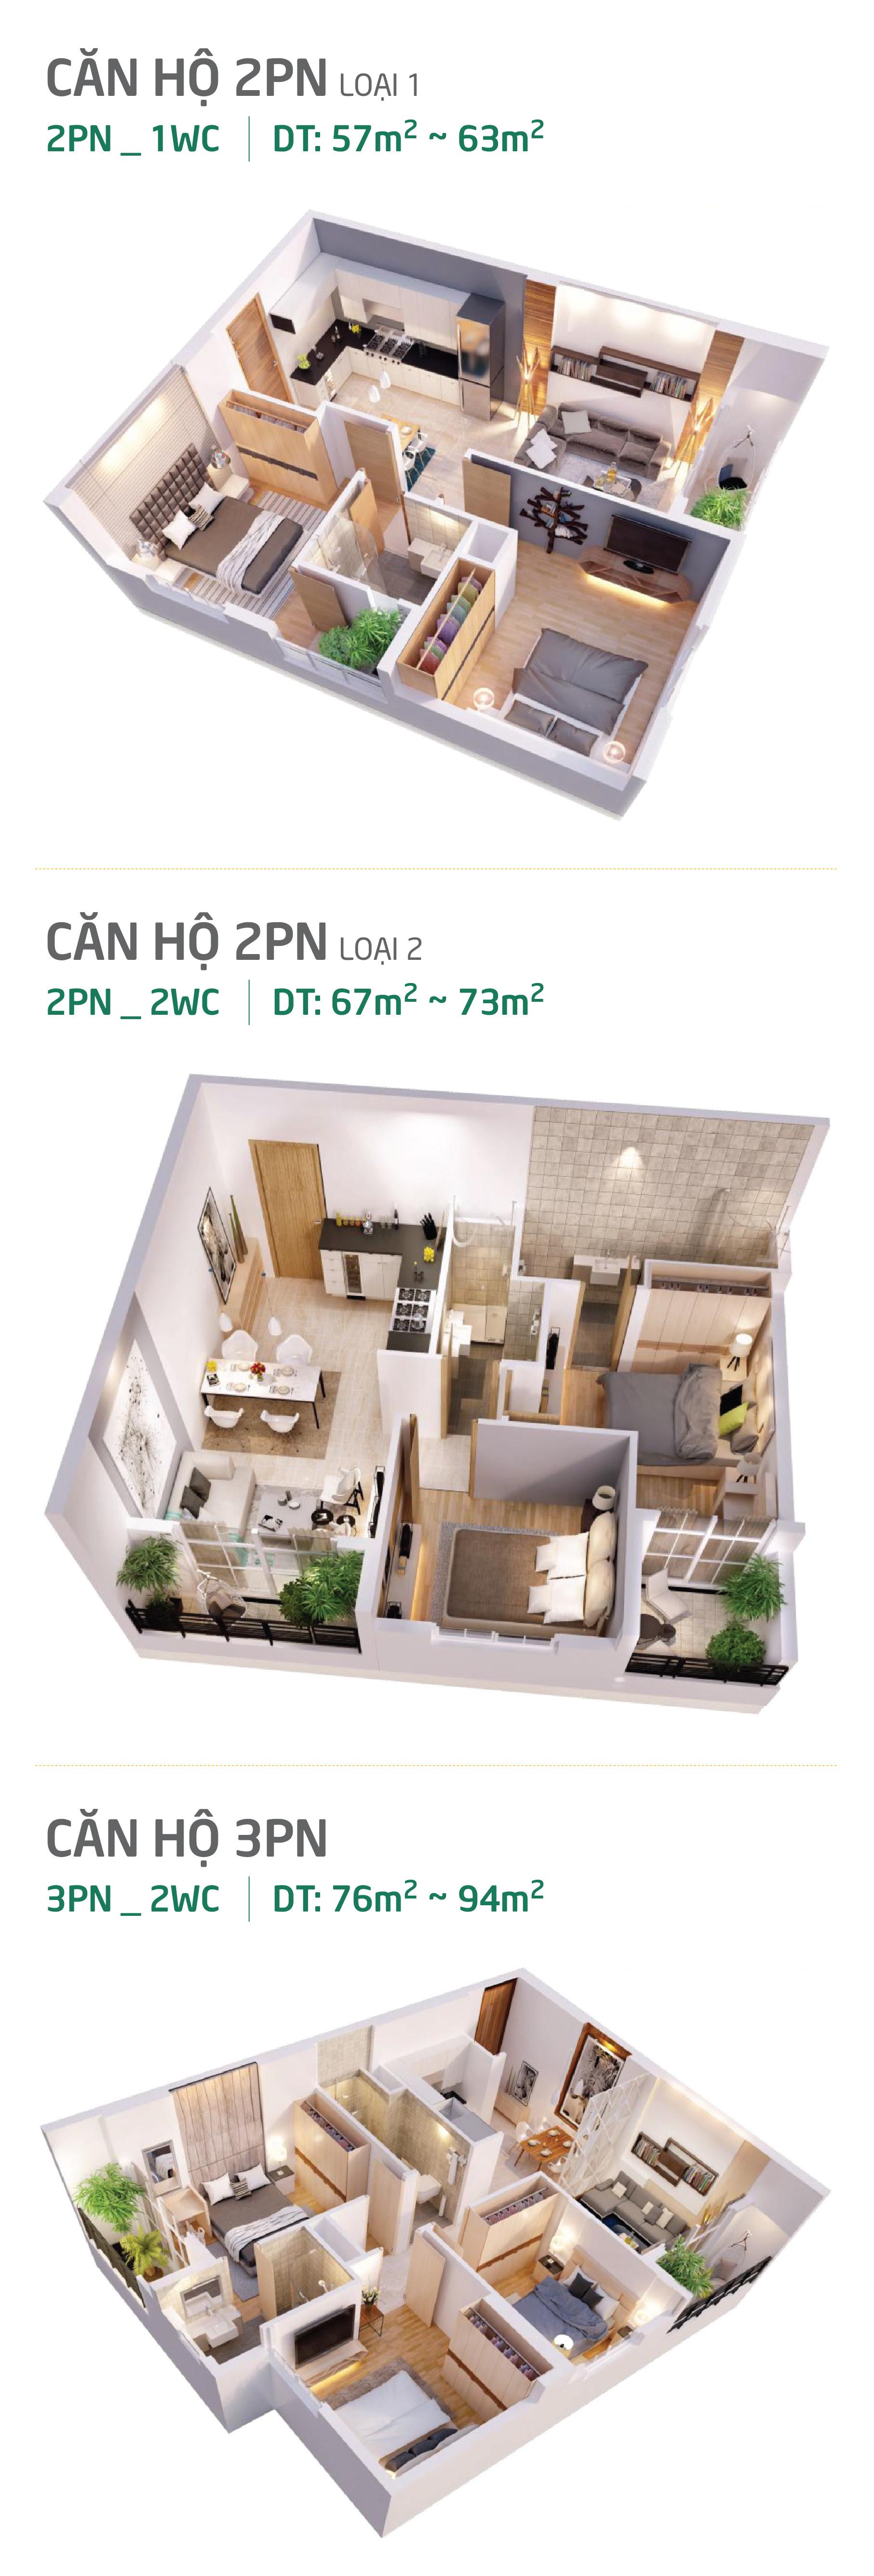 m-one-nam-sai-gon-layout